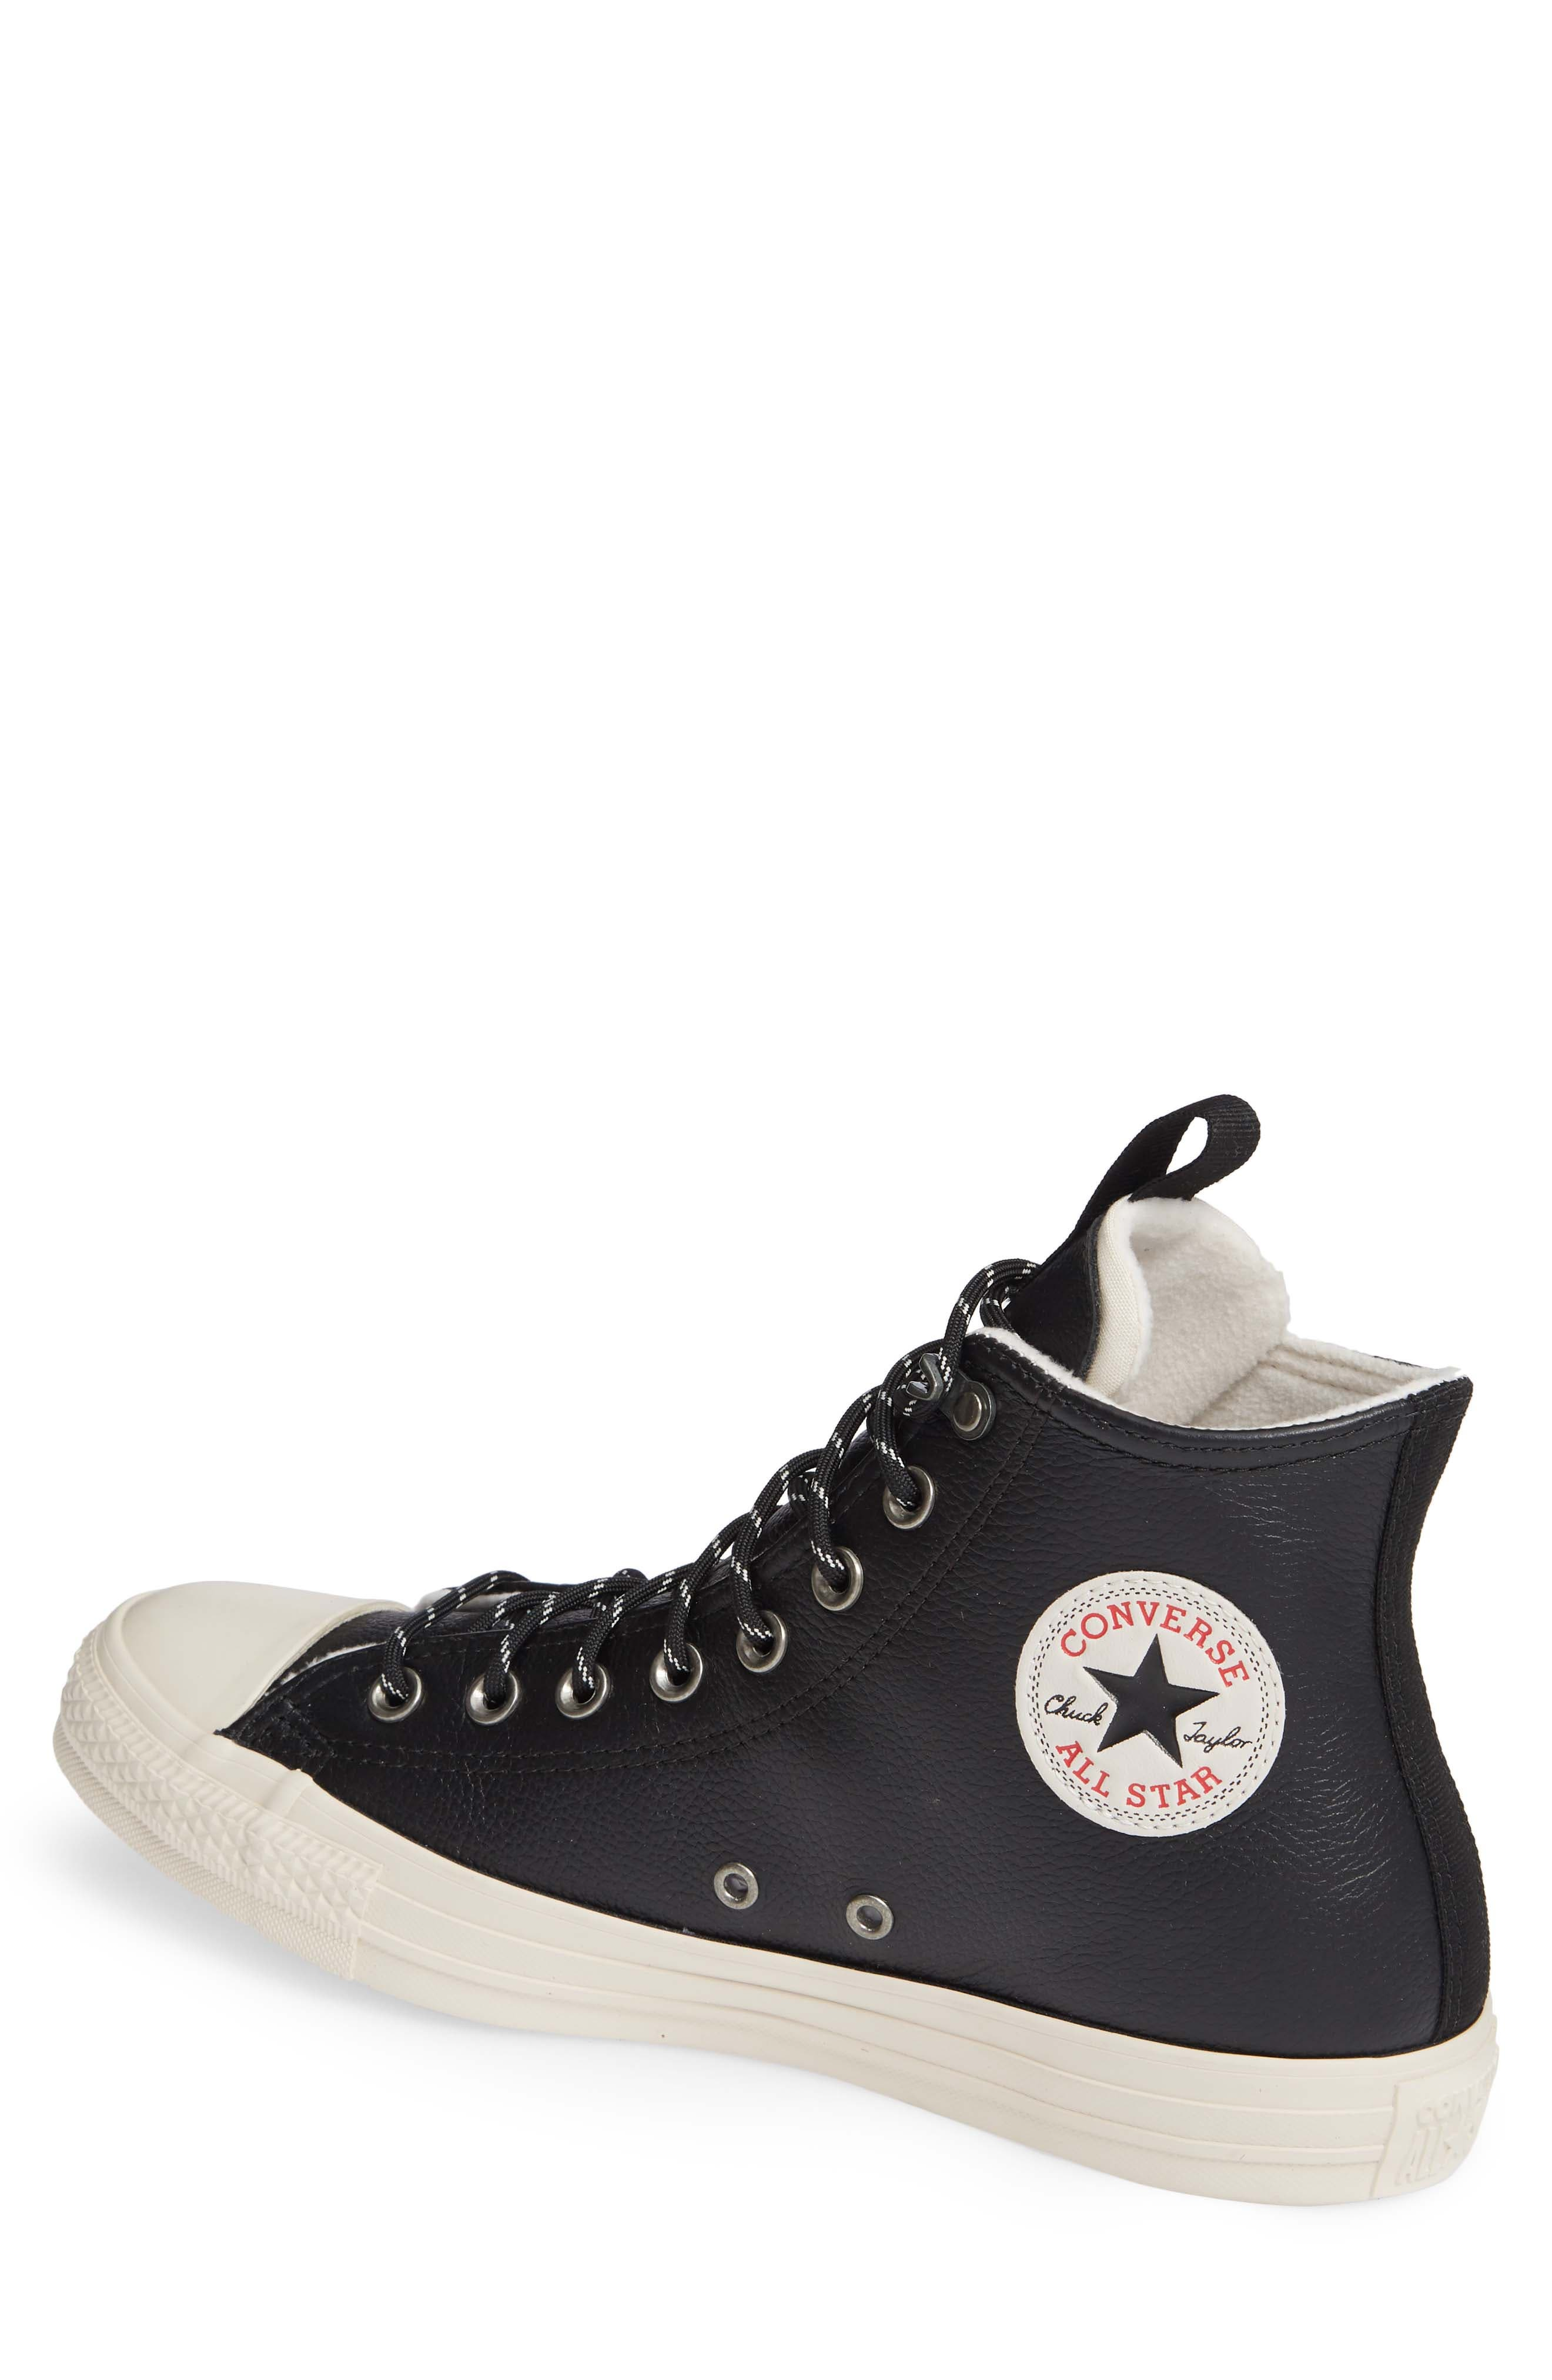 Chuck Taylor<sup>®</sup> All Star<sup>®</sup> Desert Storm Hi Sneaker,                             Alternate thumbnail 2, color,                             MASON/ BLACK/ DRIFTWOOD